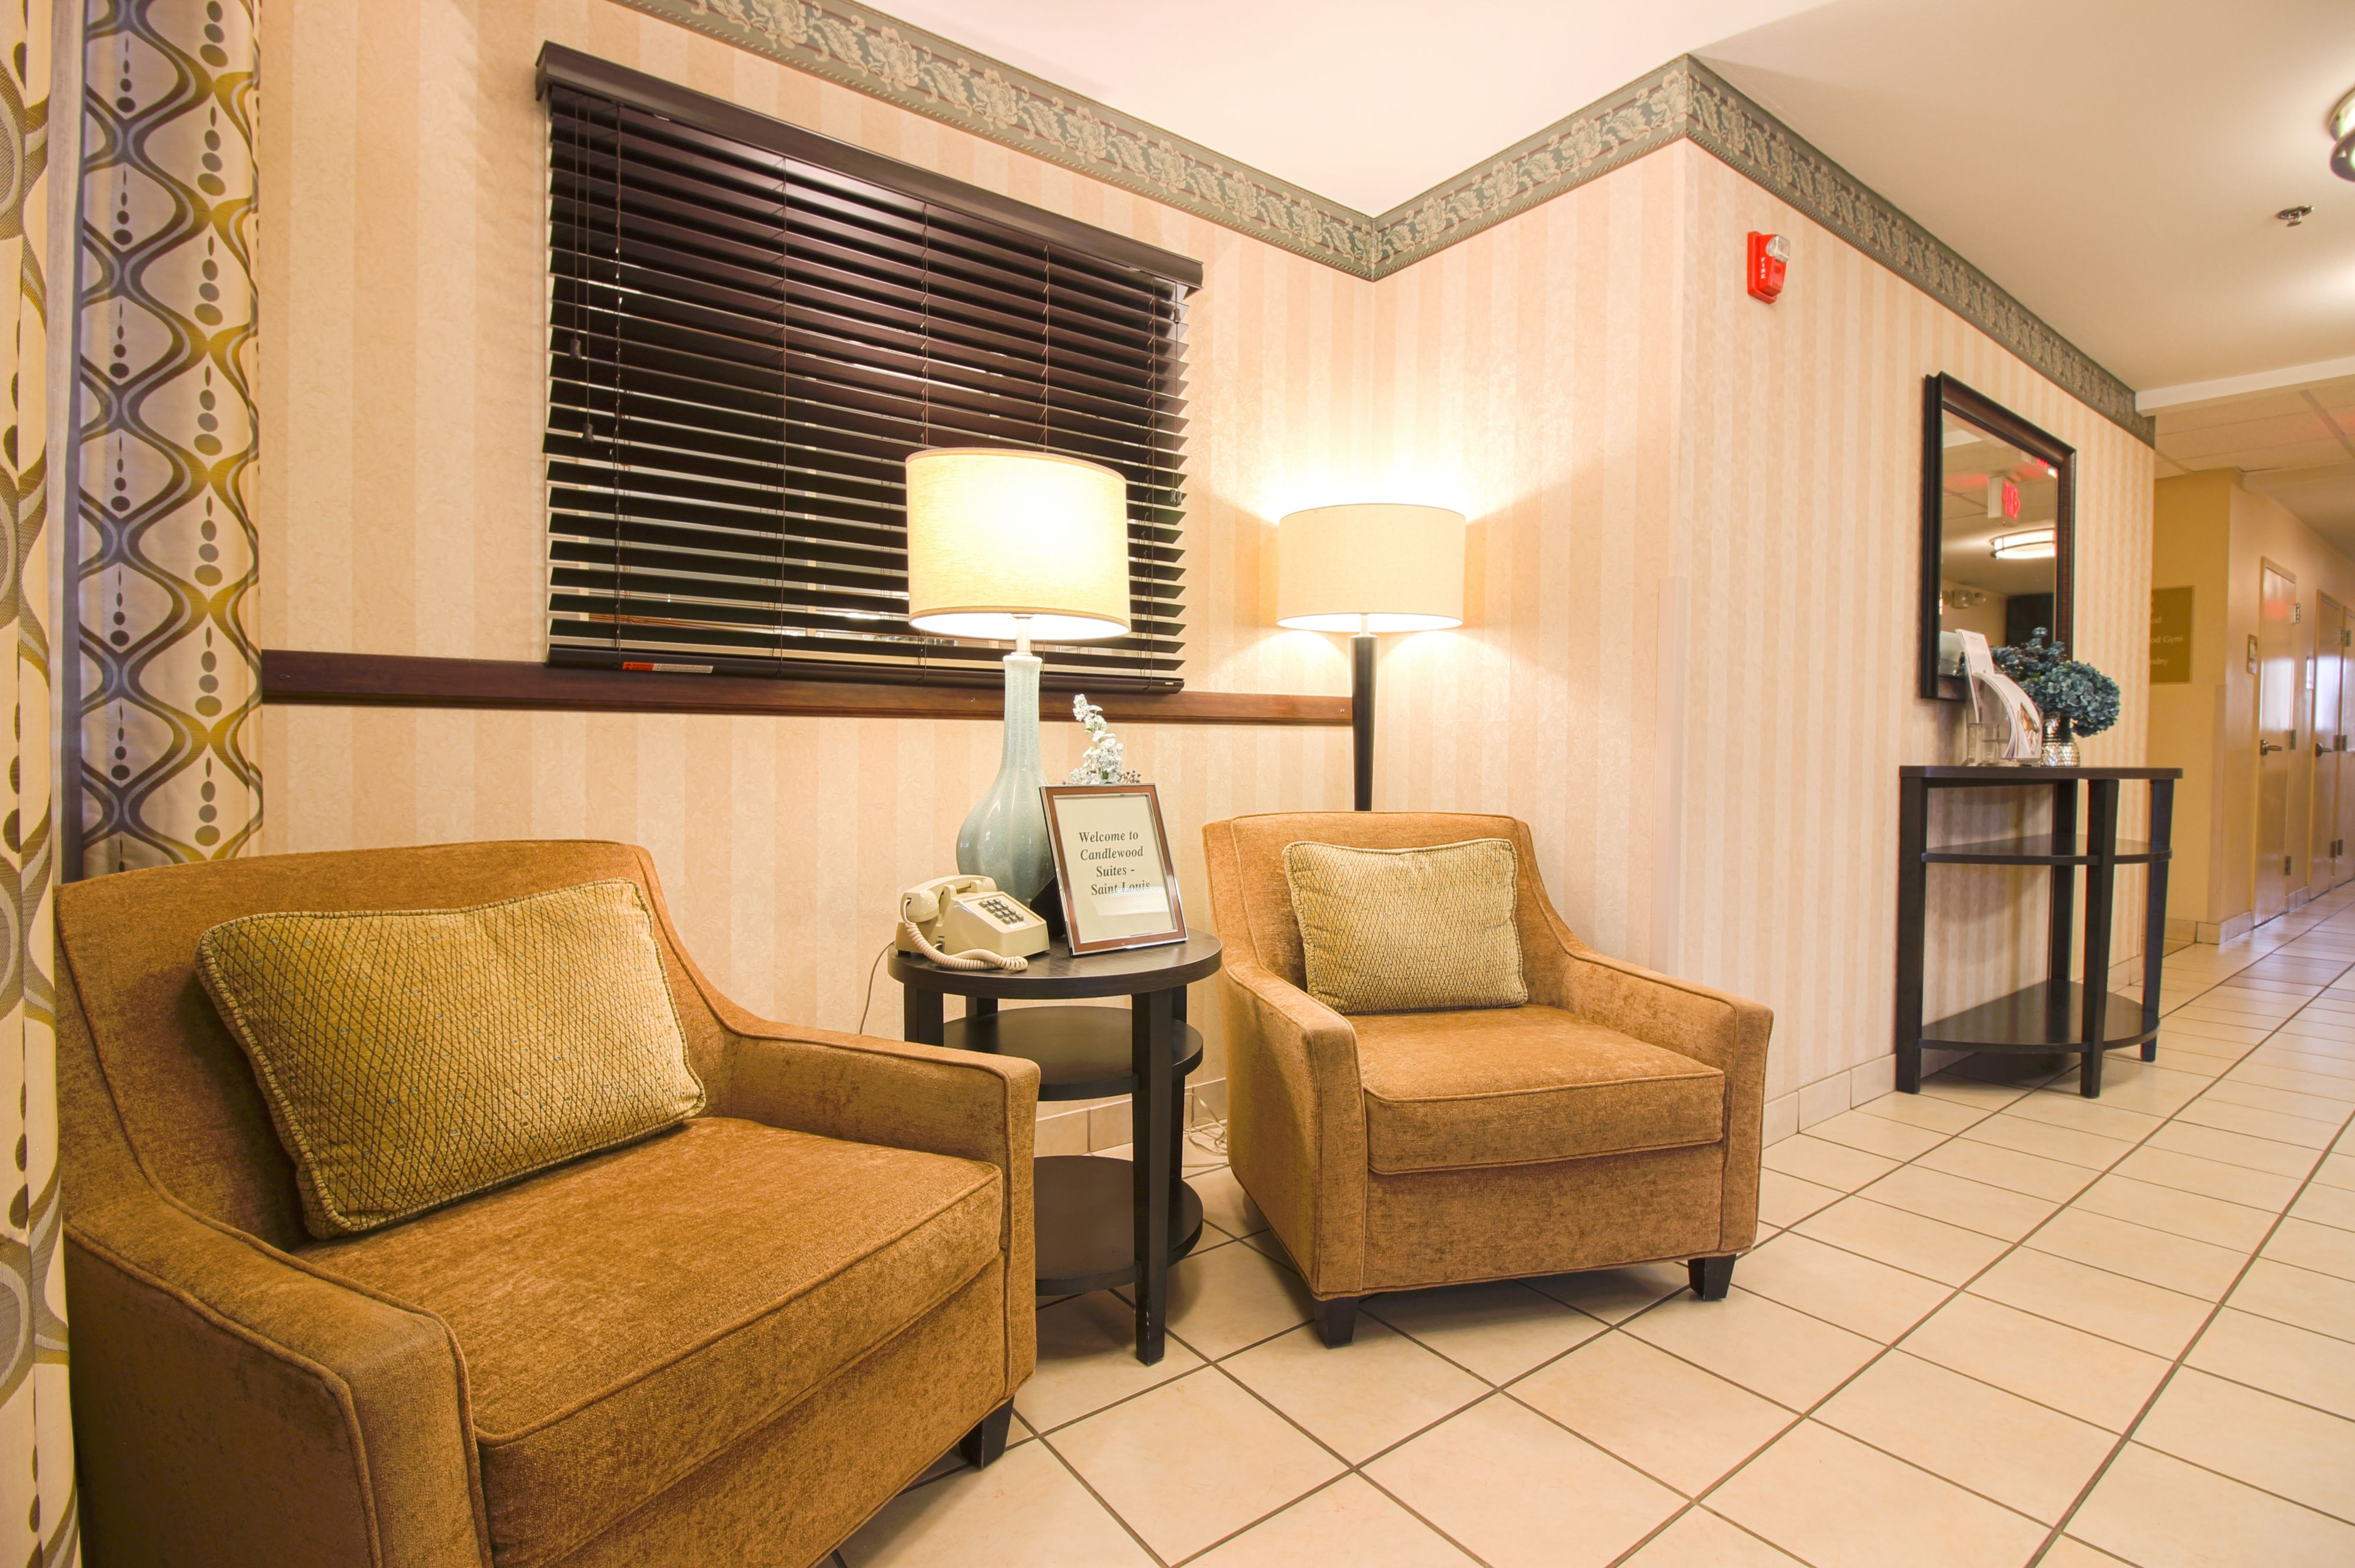 Candlewood Suites St. Louis image 6